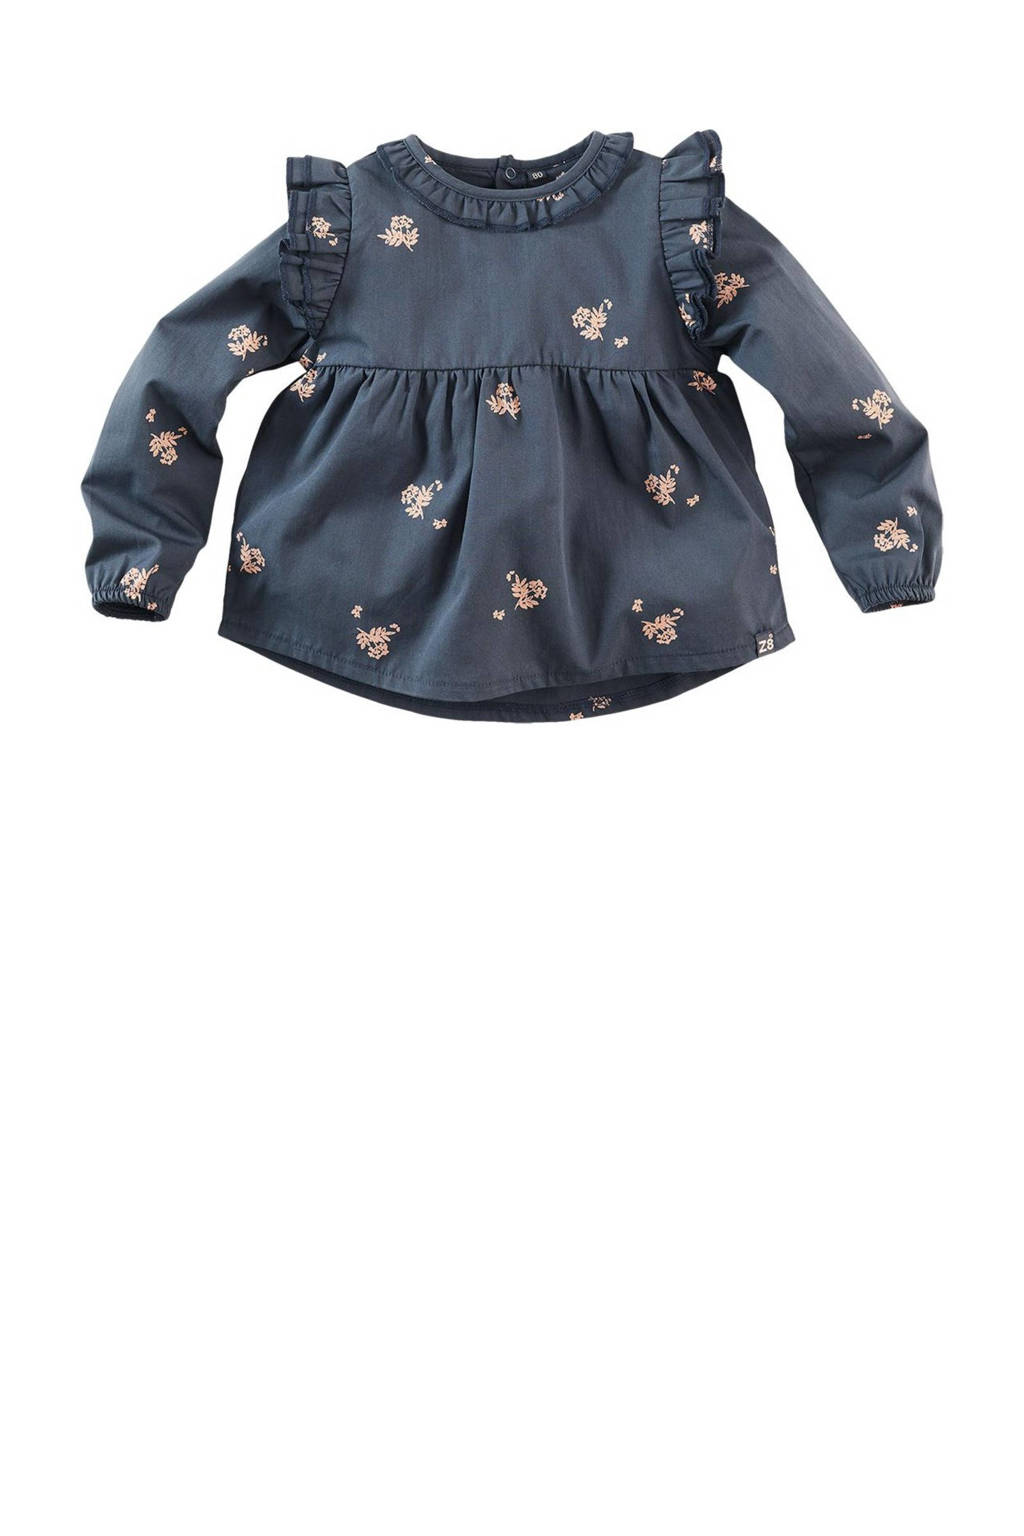 Z8 jurk Nani met all over print en ruches donkerblauw, Donkerblauw